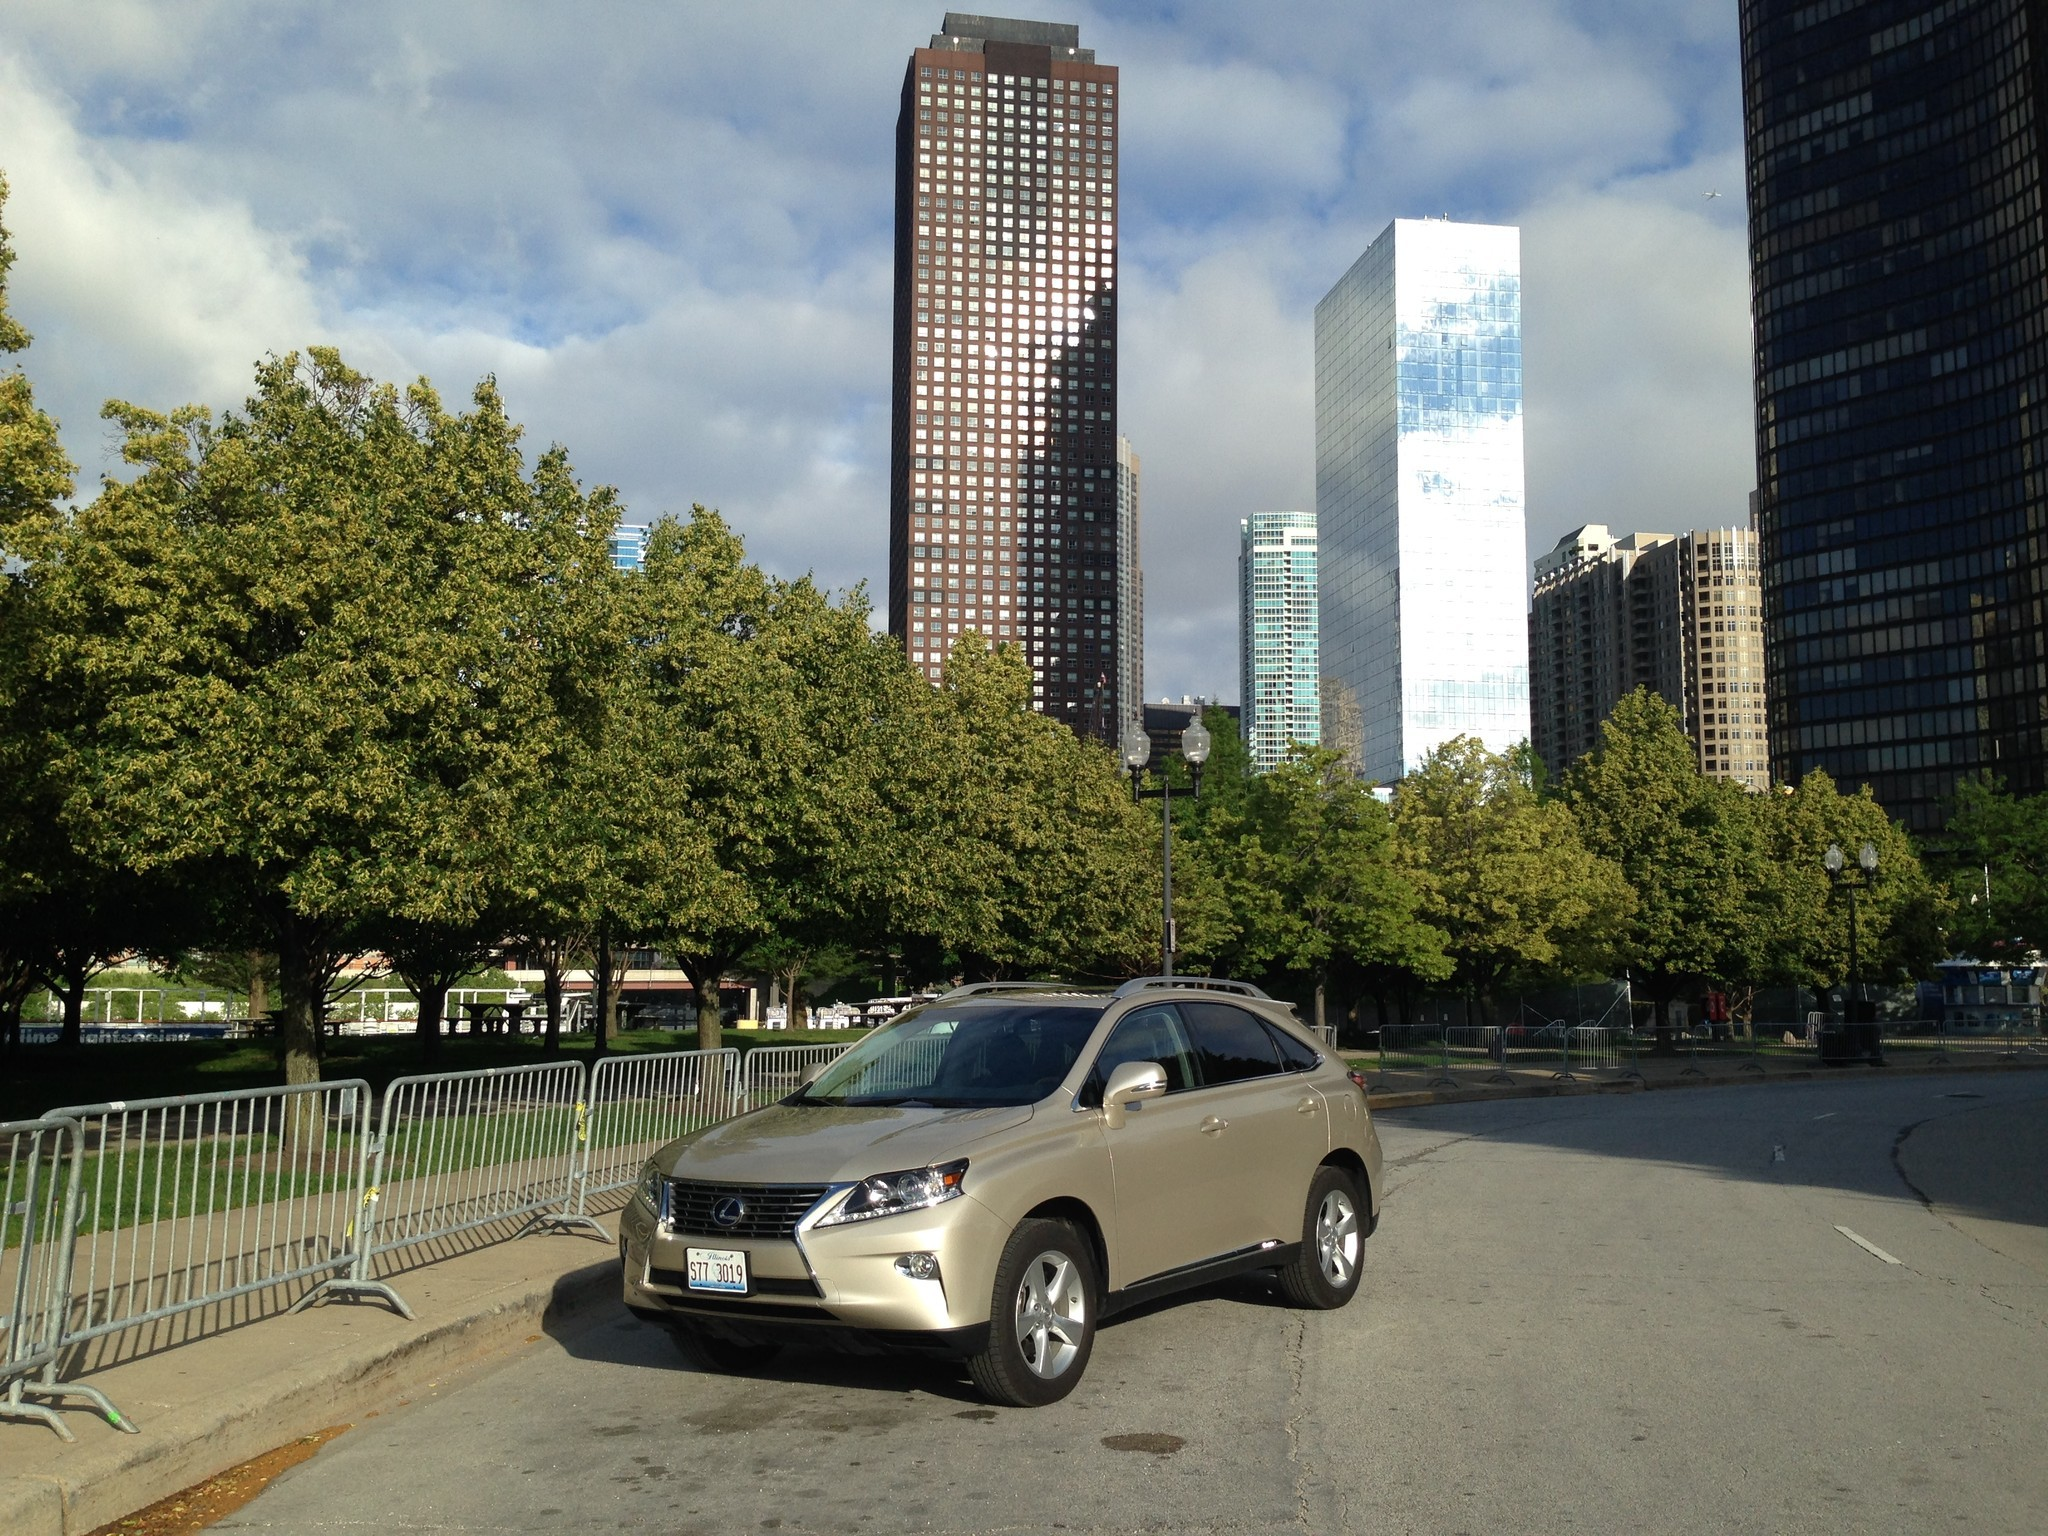 virginia beach automotive lexus va city revo select rx in